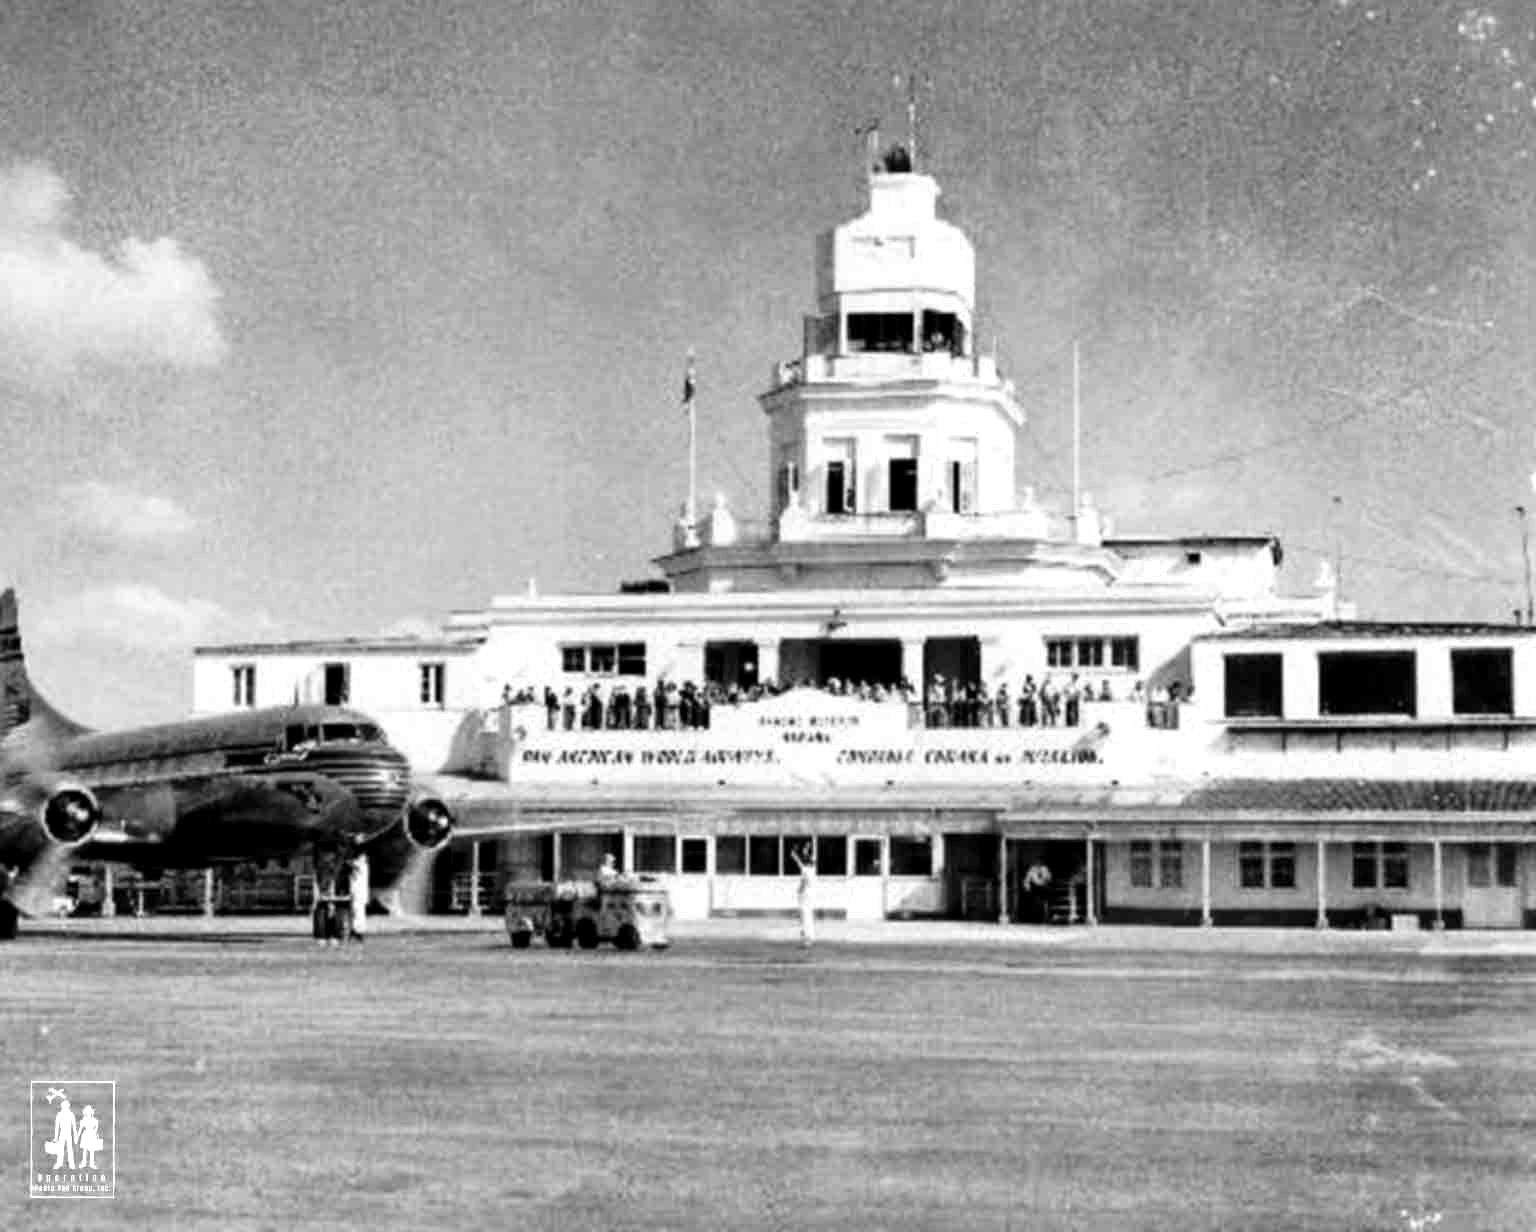 Boyero's Airport in Cuba